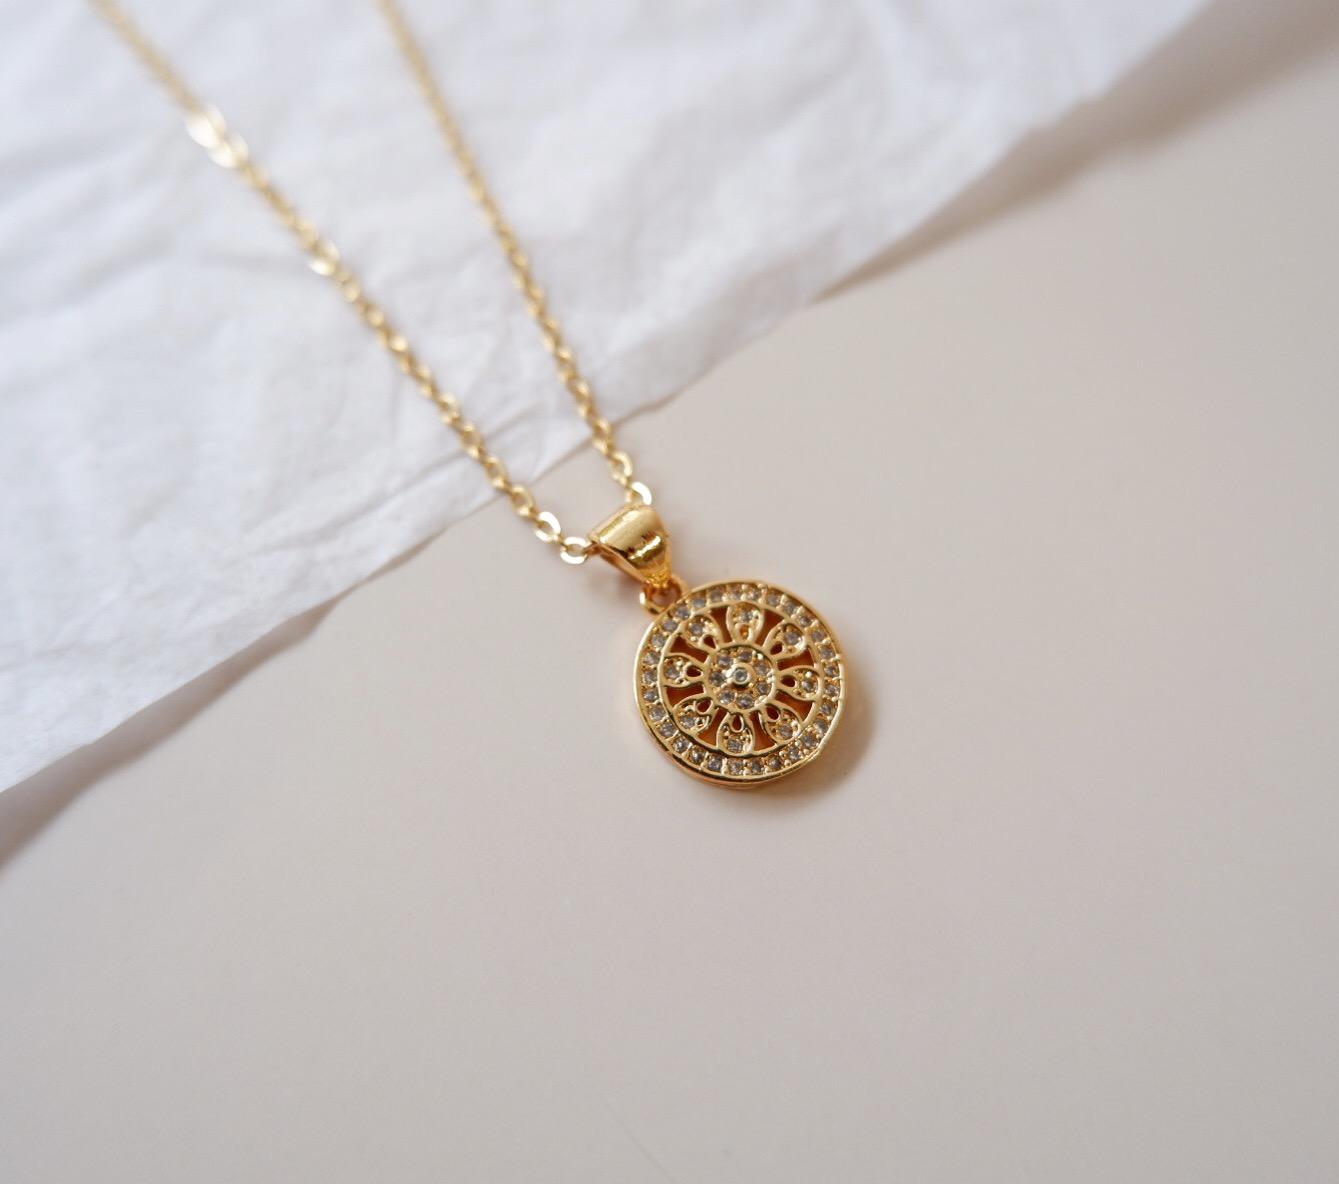 Plana-Necklace-1.jpeg